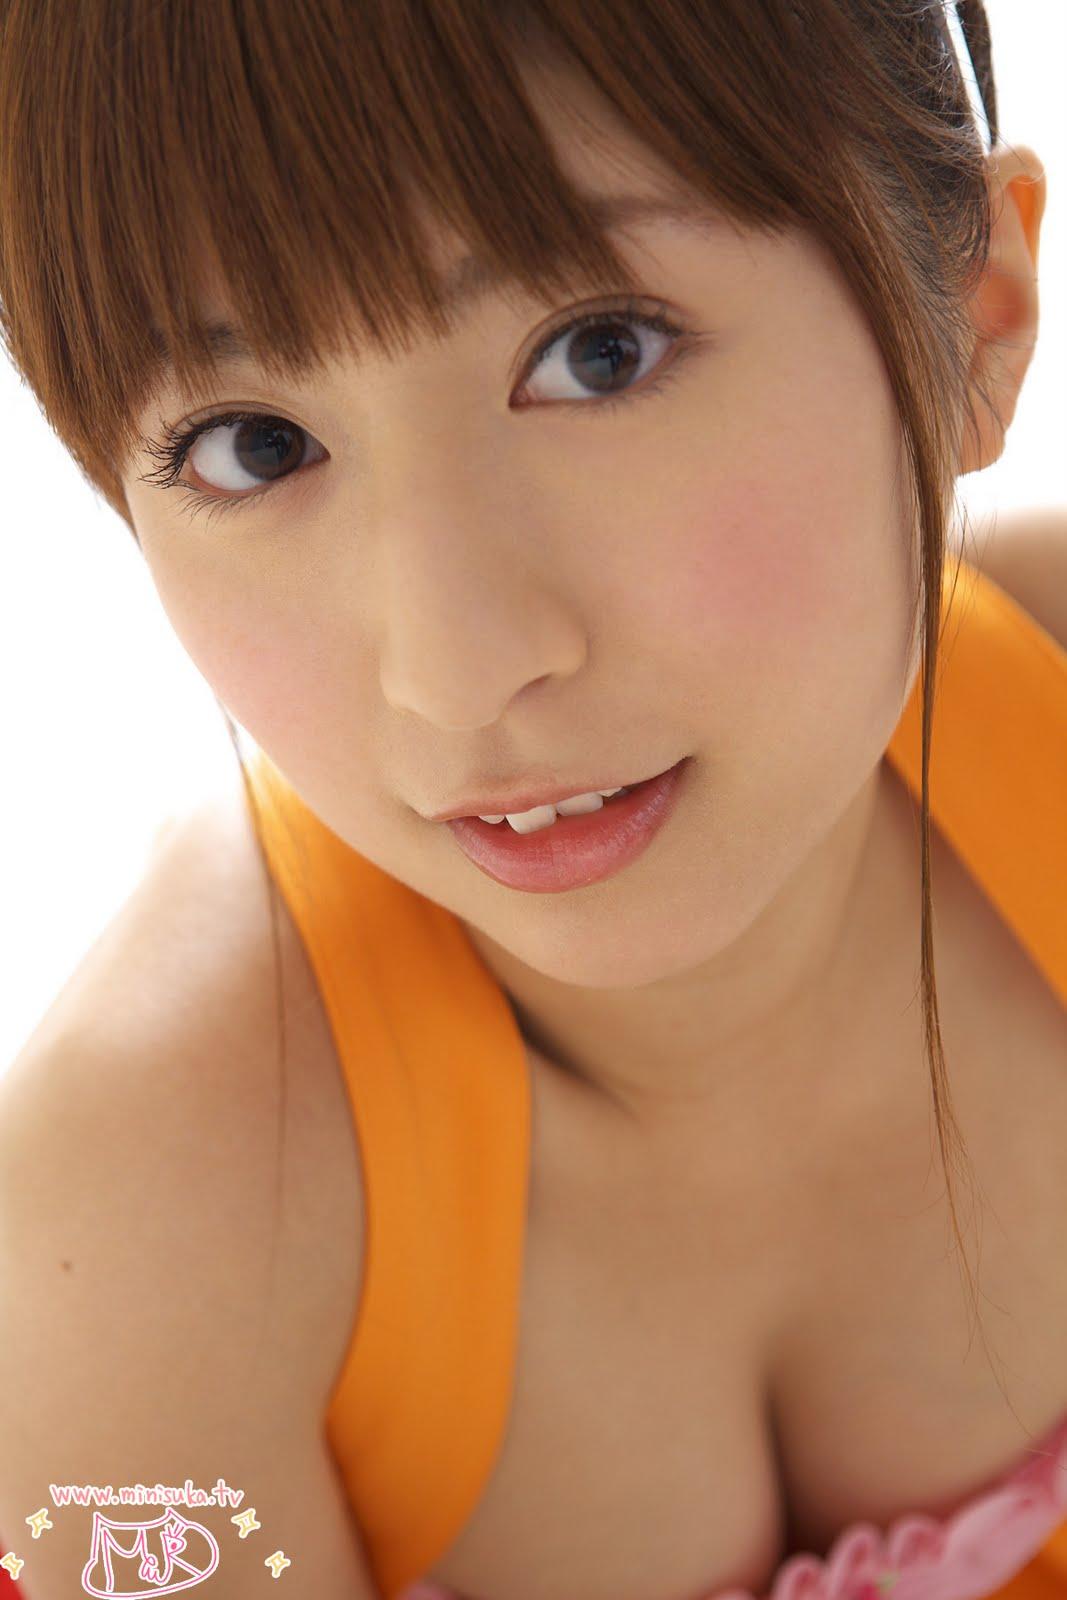 rio bueno single asian girls Japanese av idols, real asian teens and hot japanese schoolgirls naked jp japan pussy japan porn galleries.